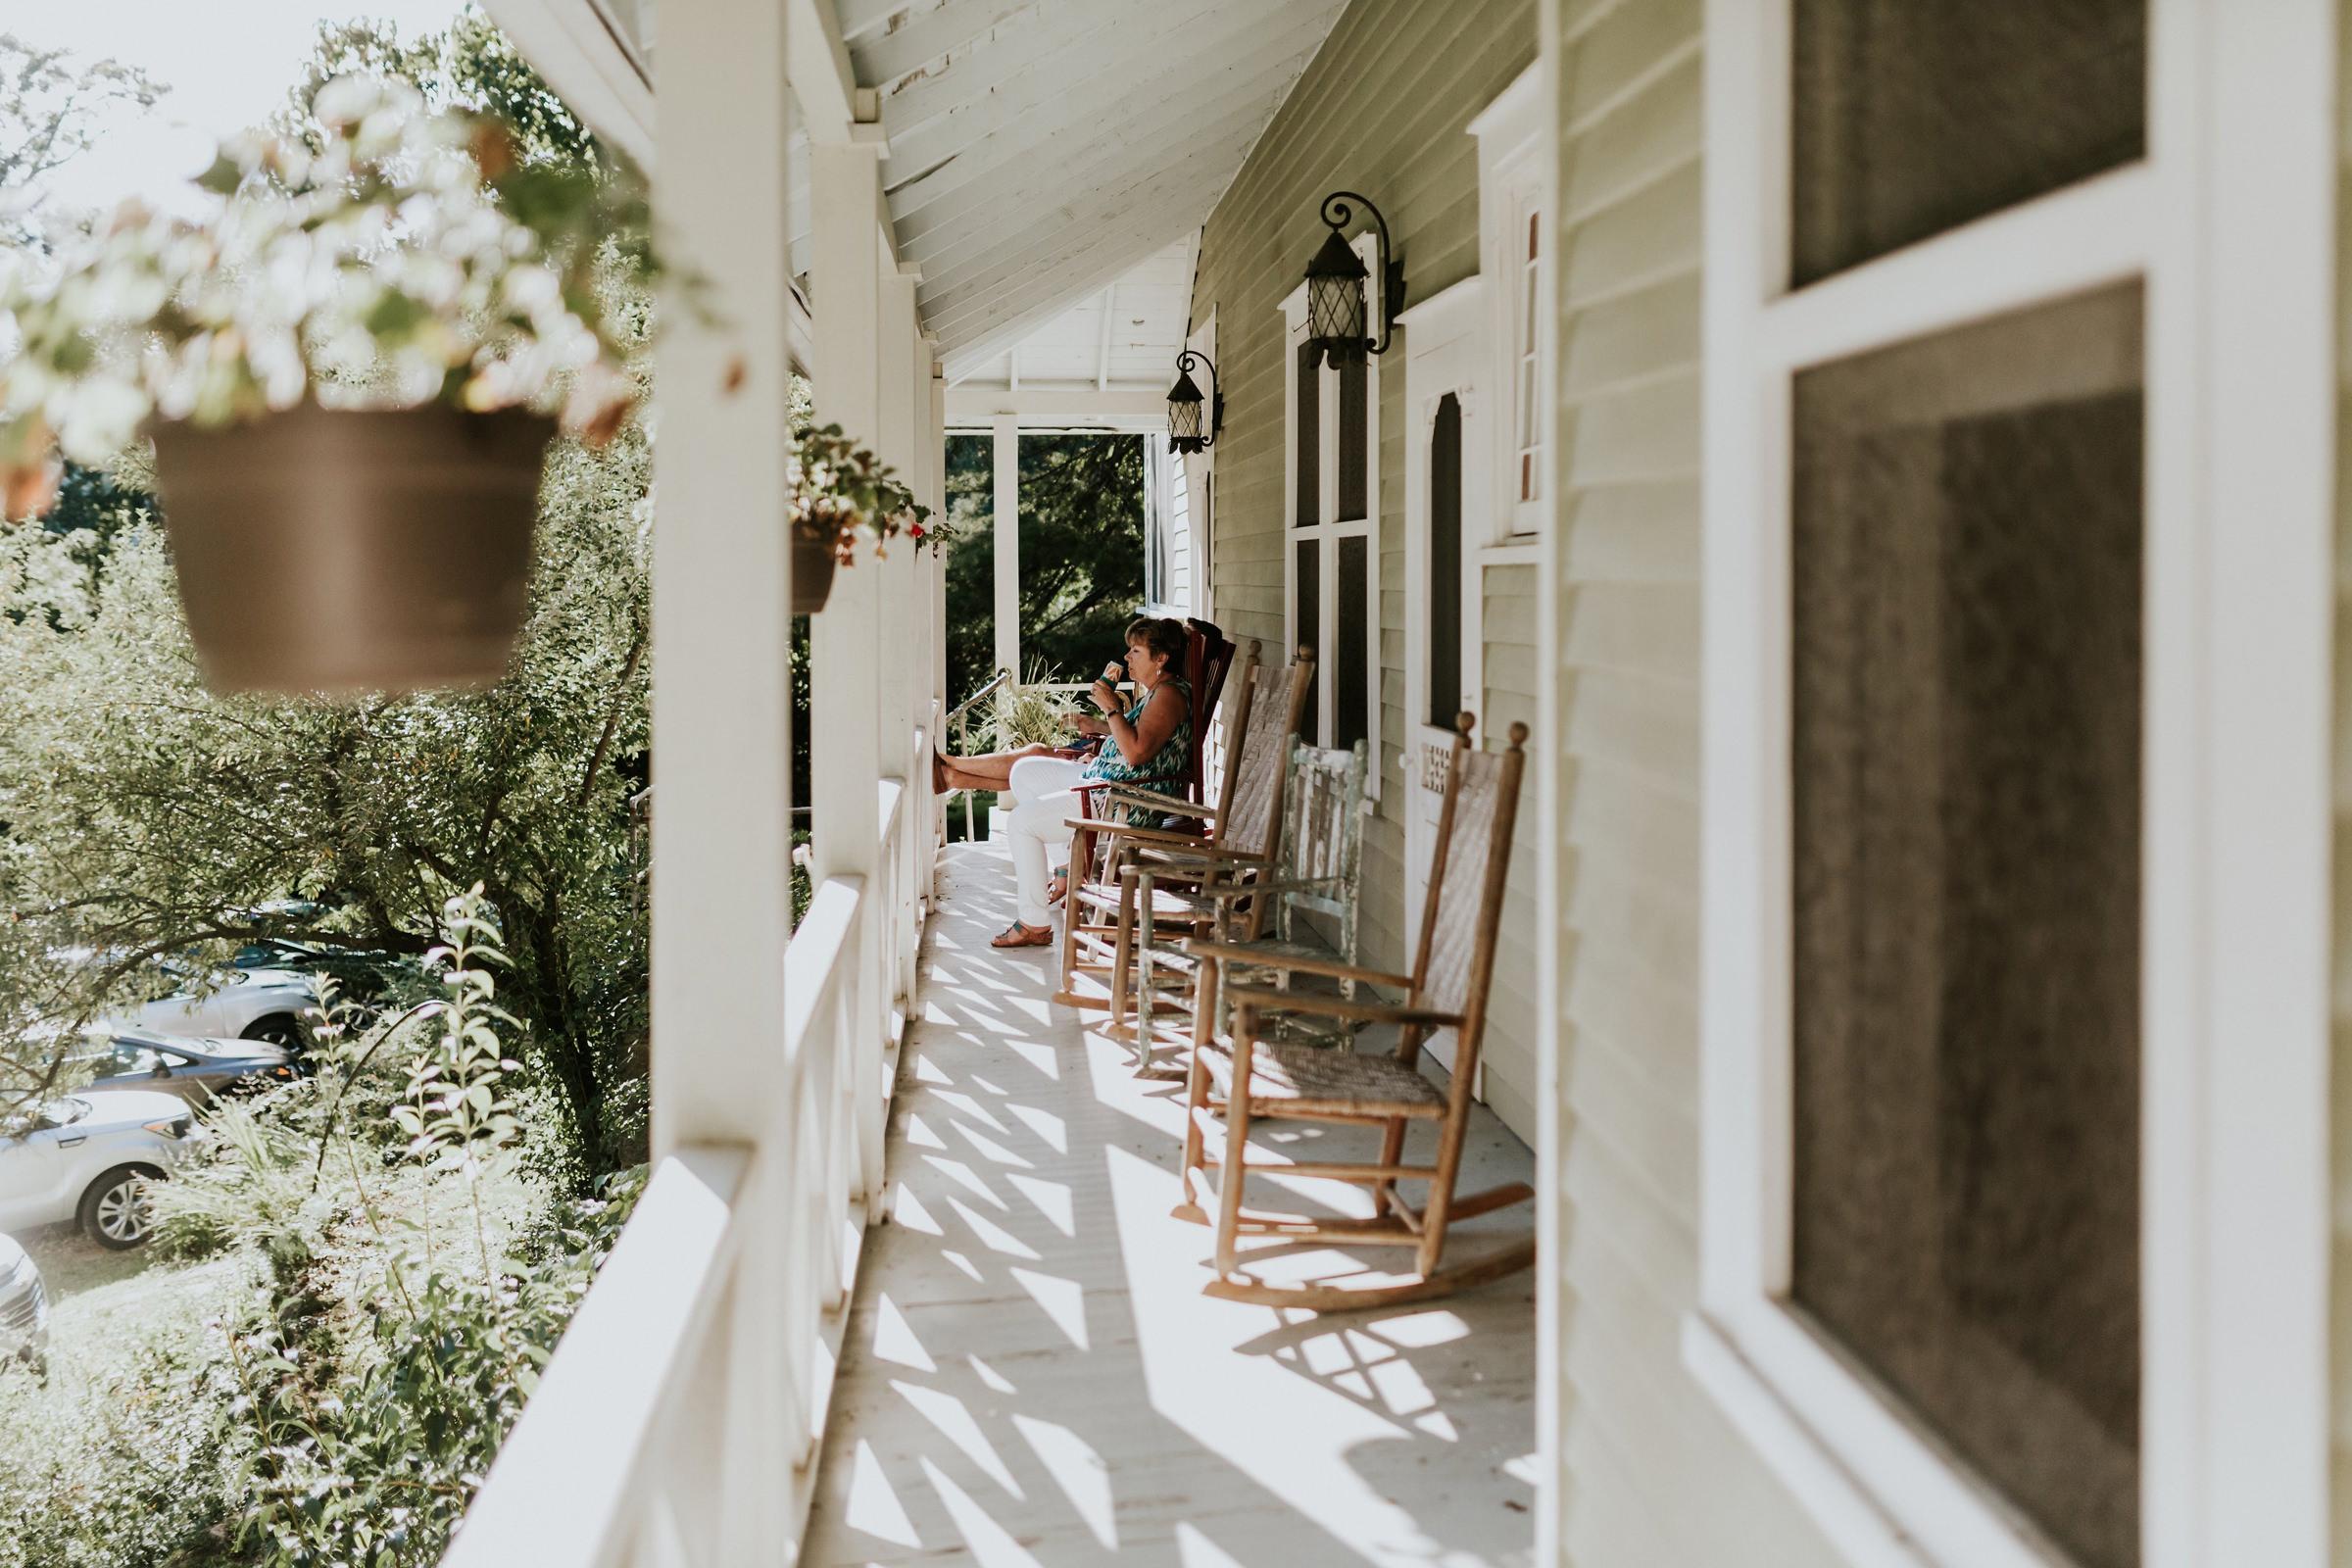 Kentucky_Candid_Wedding_Photographer_005.jpg